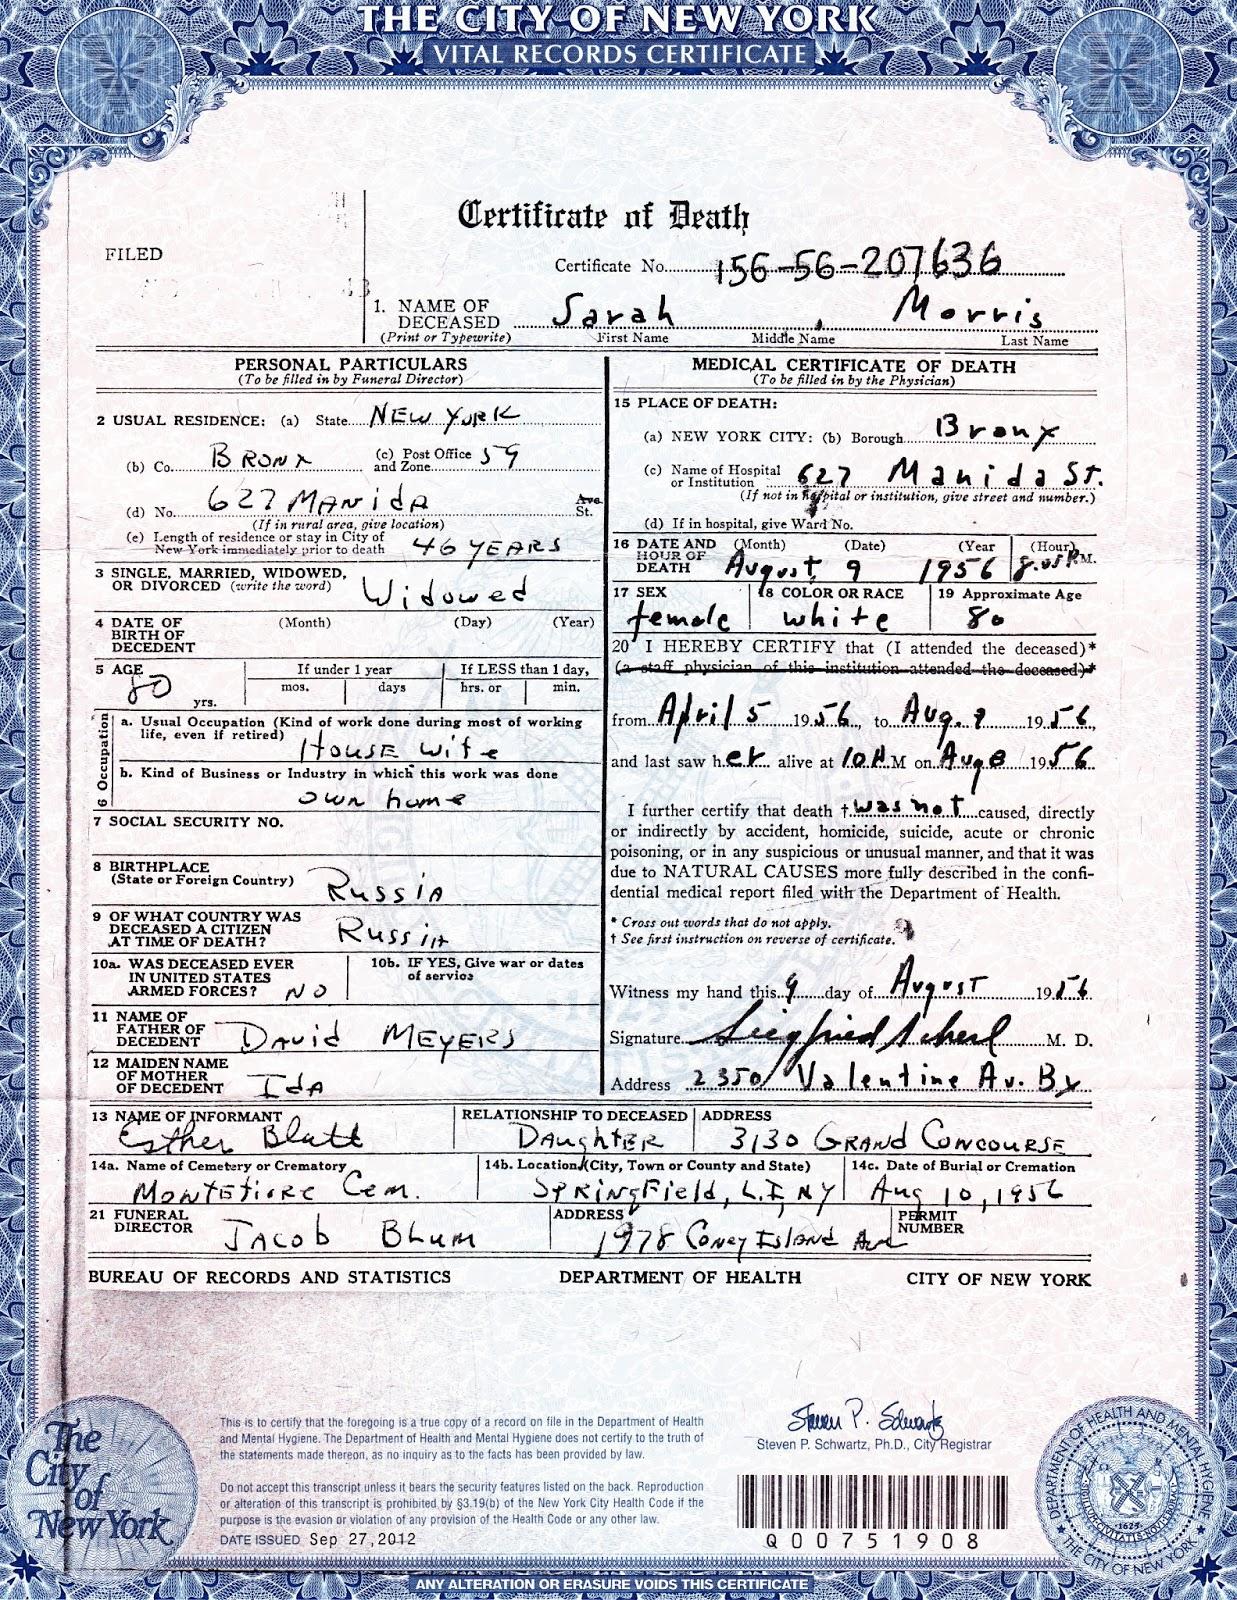 New York City Death Certificate Genealogy